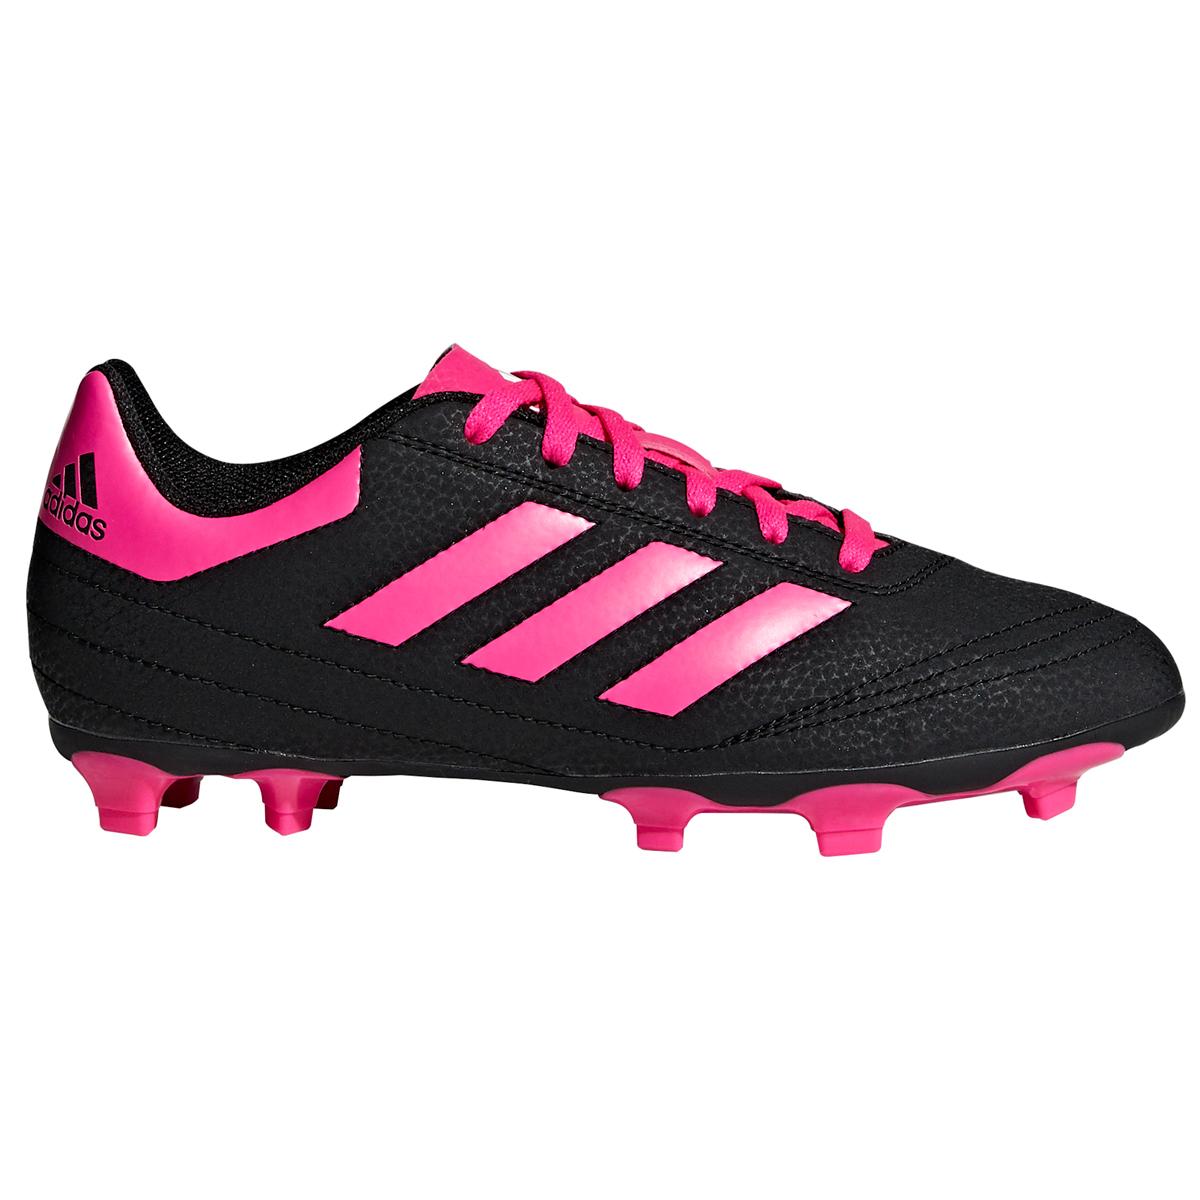 Adidas Kids' Goletto Vi Fg Soccer Cleats - Black, 13